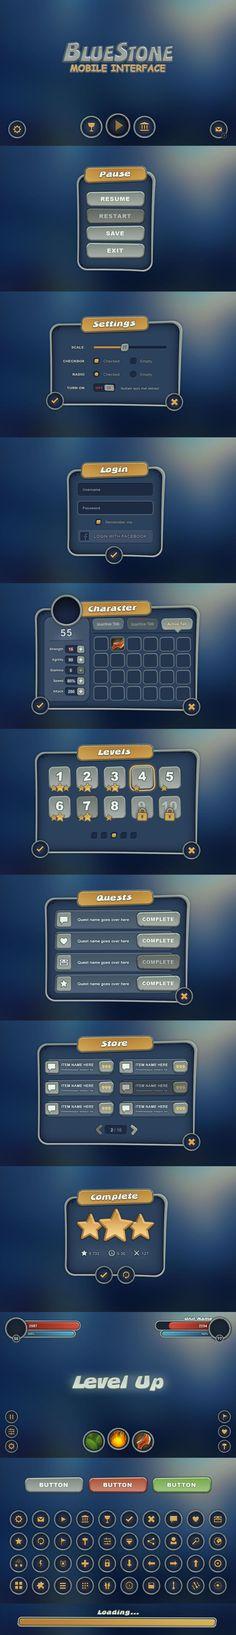 BlueStone Mobile UI - http://evilsystem.eu/assetstore/asset/BlueStone_Mobile_UI/